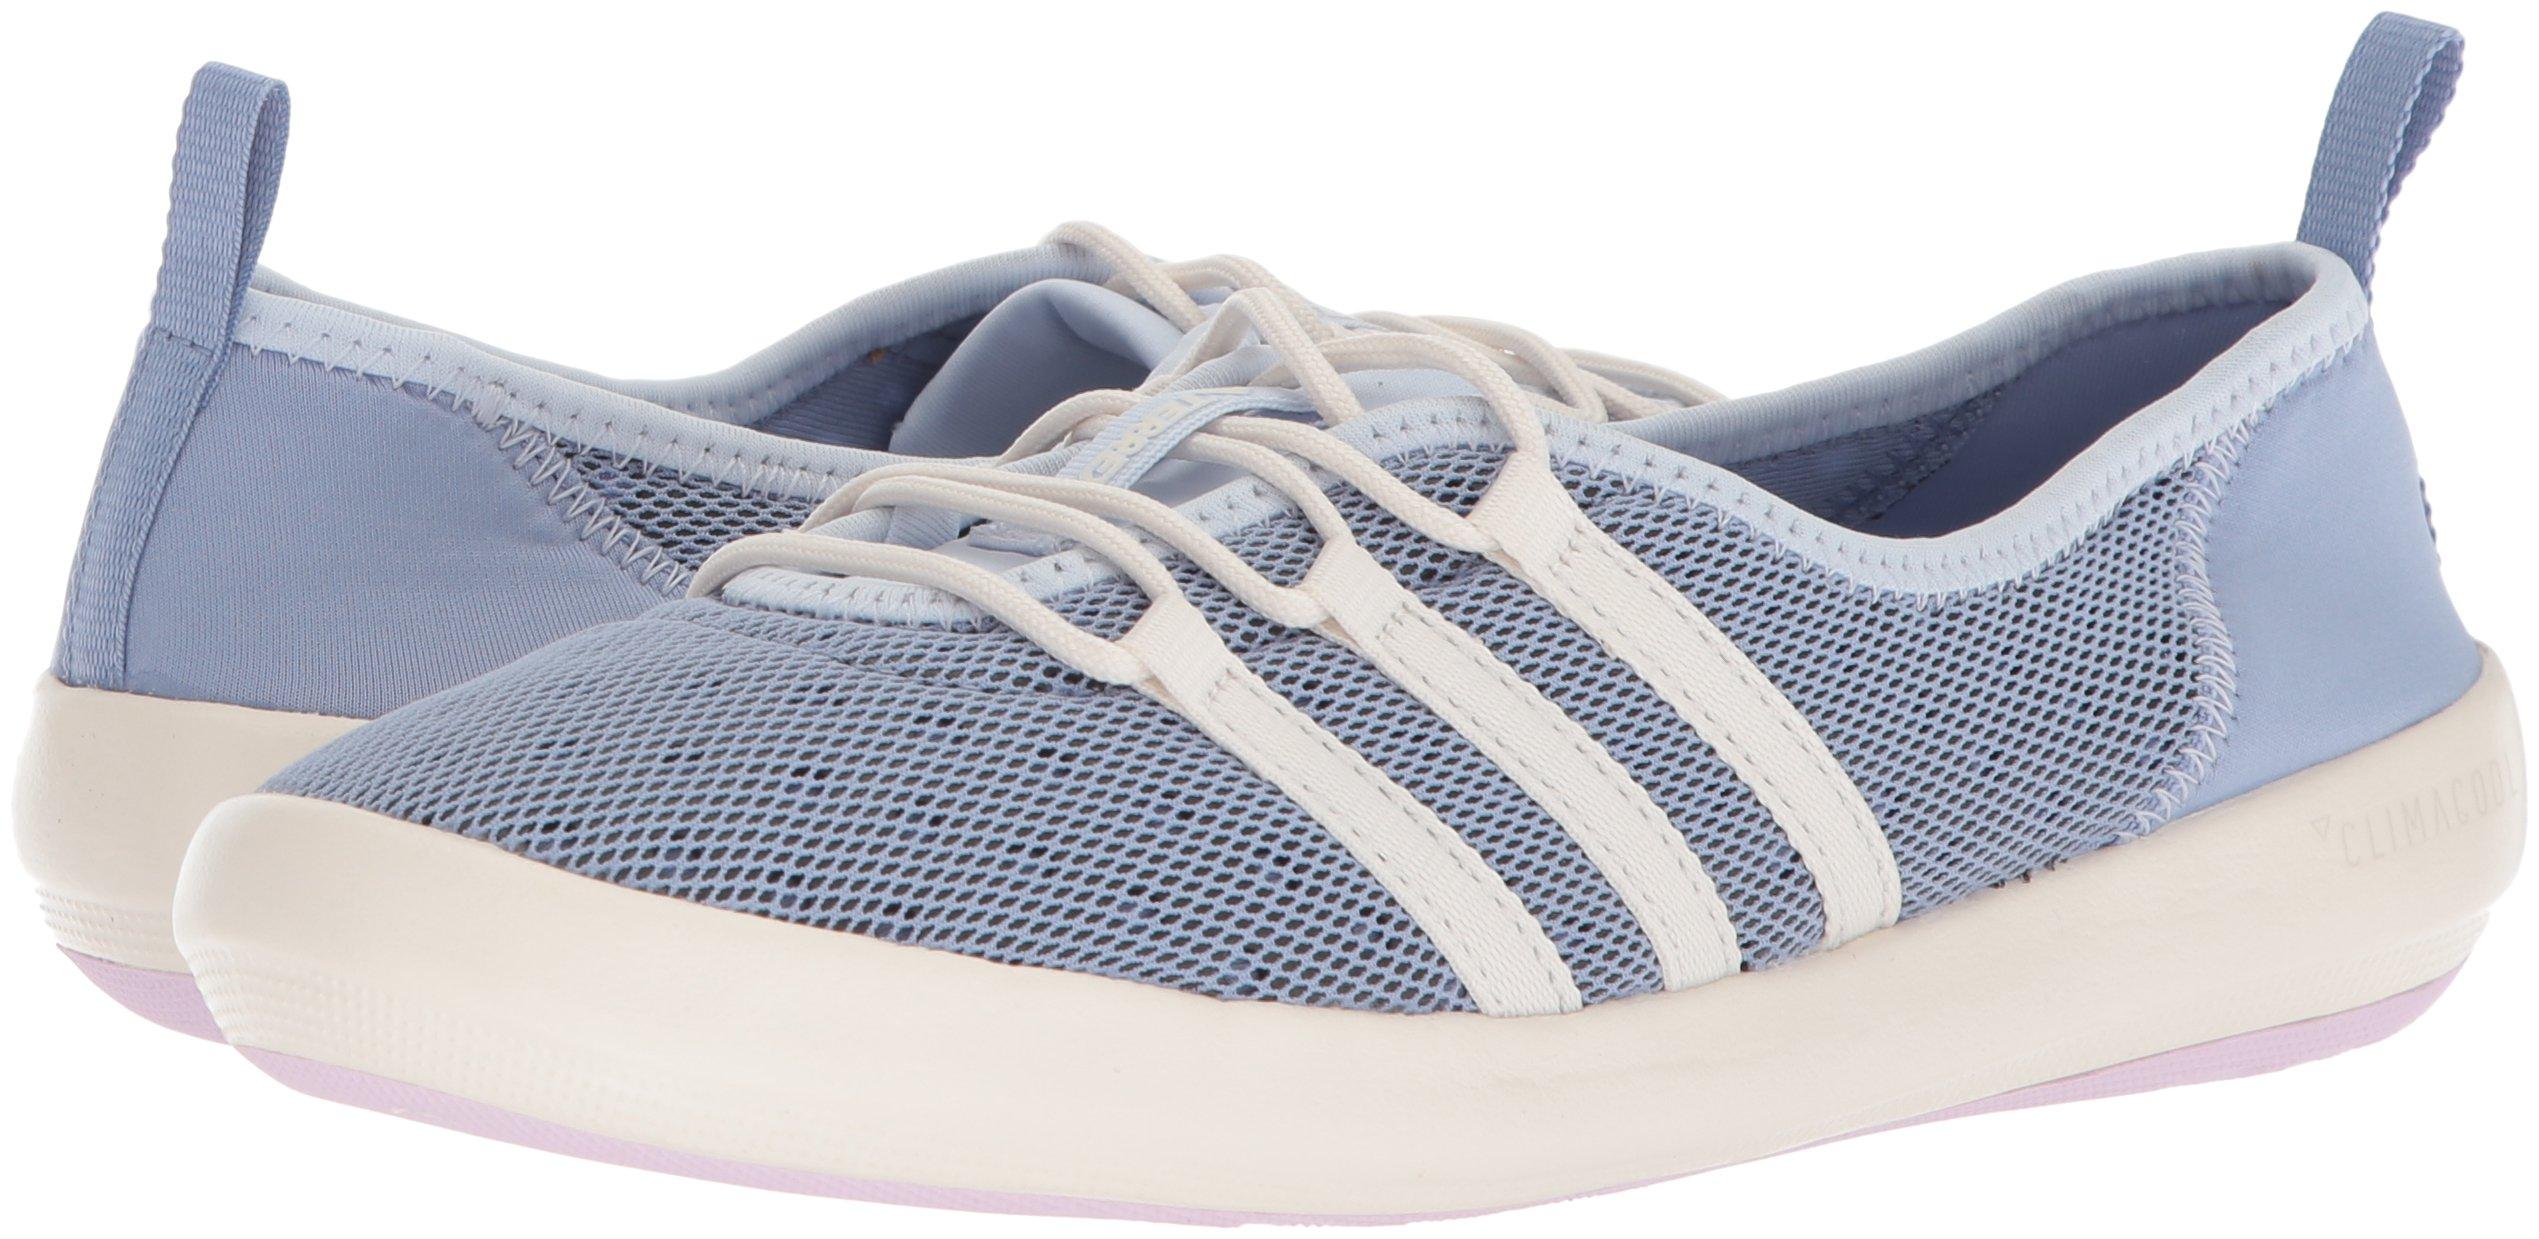 adidas outdoor Women's Terrex CC Boat Sleek Walking Shoe